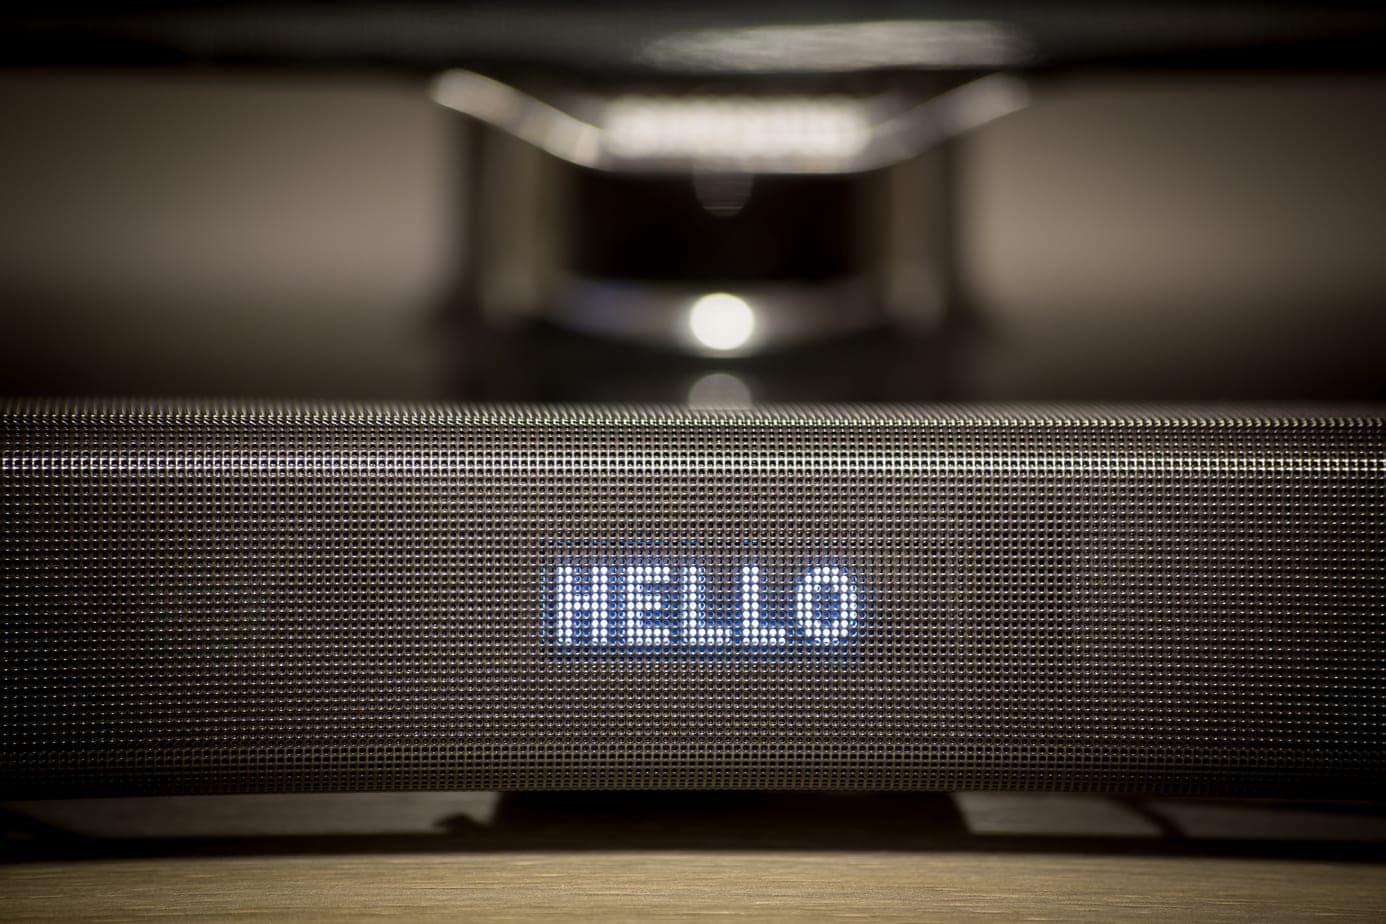 Soundbar Startup